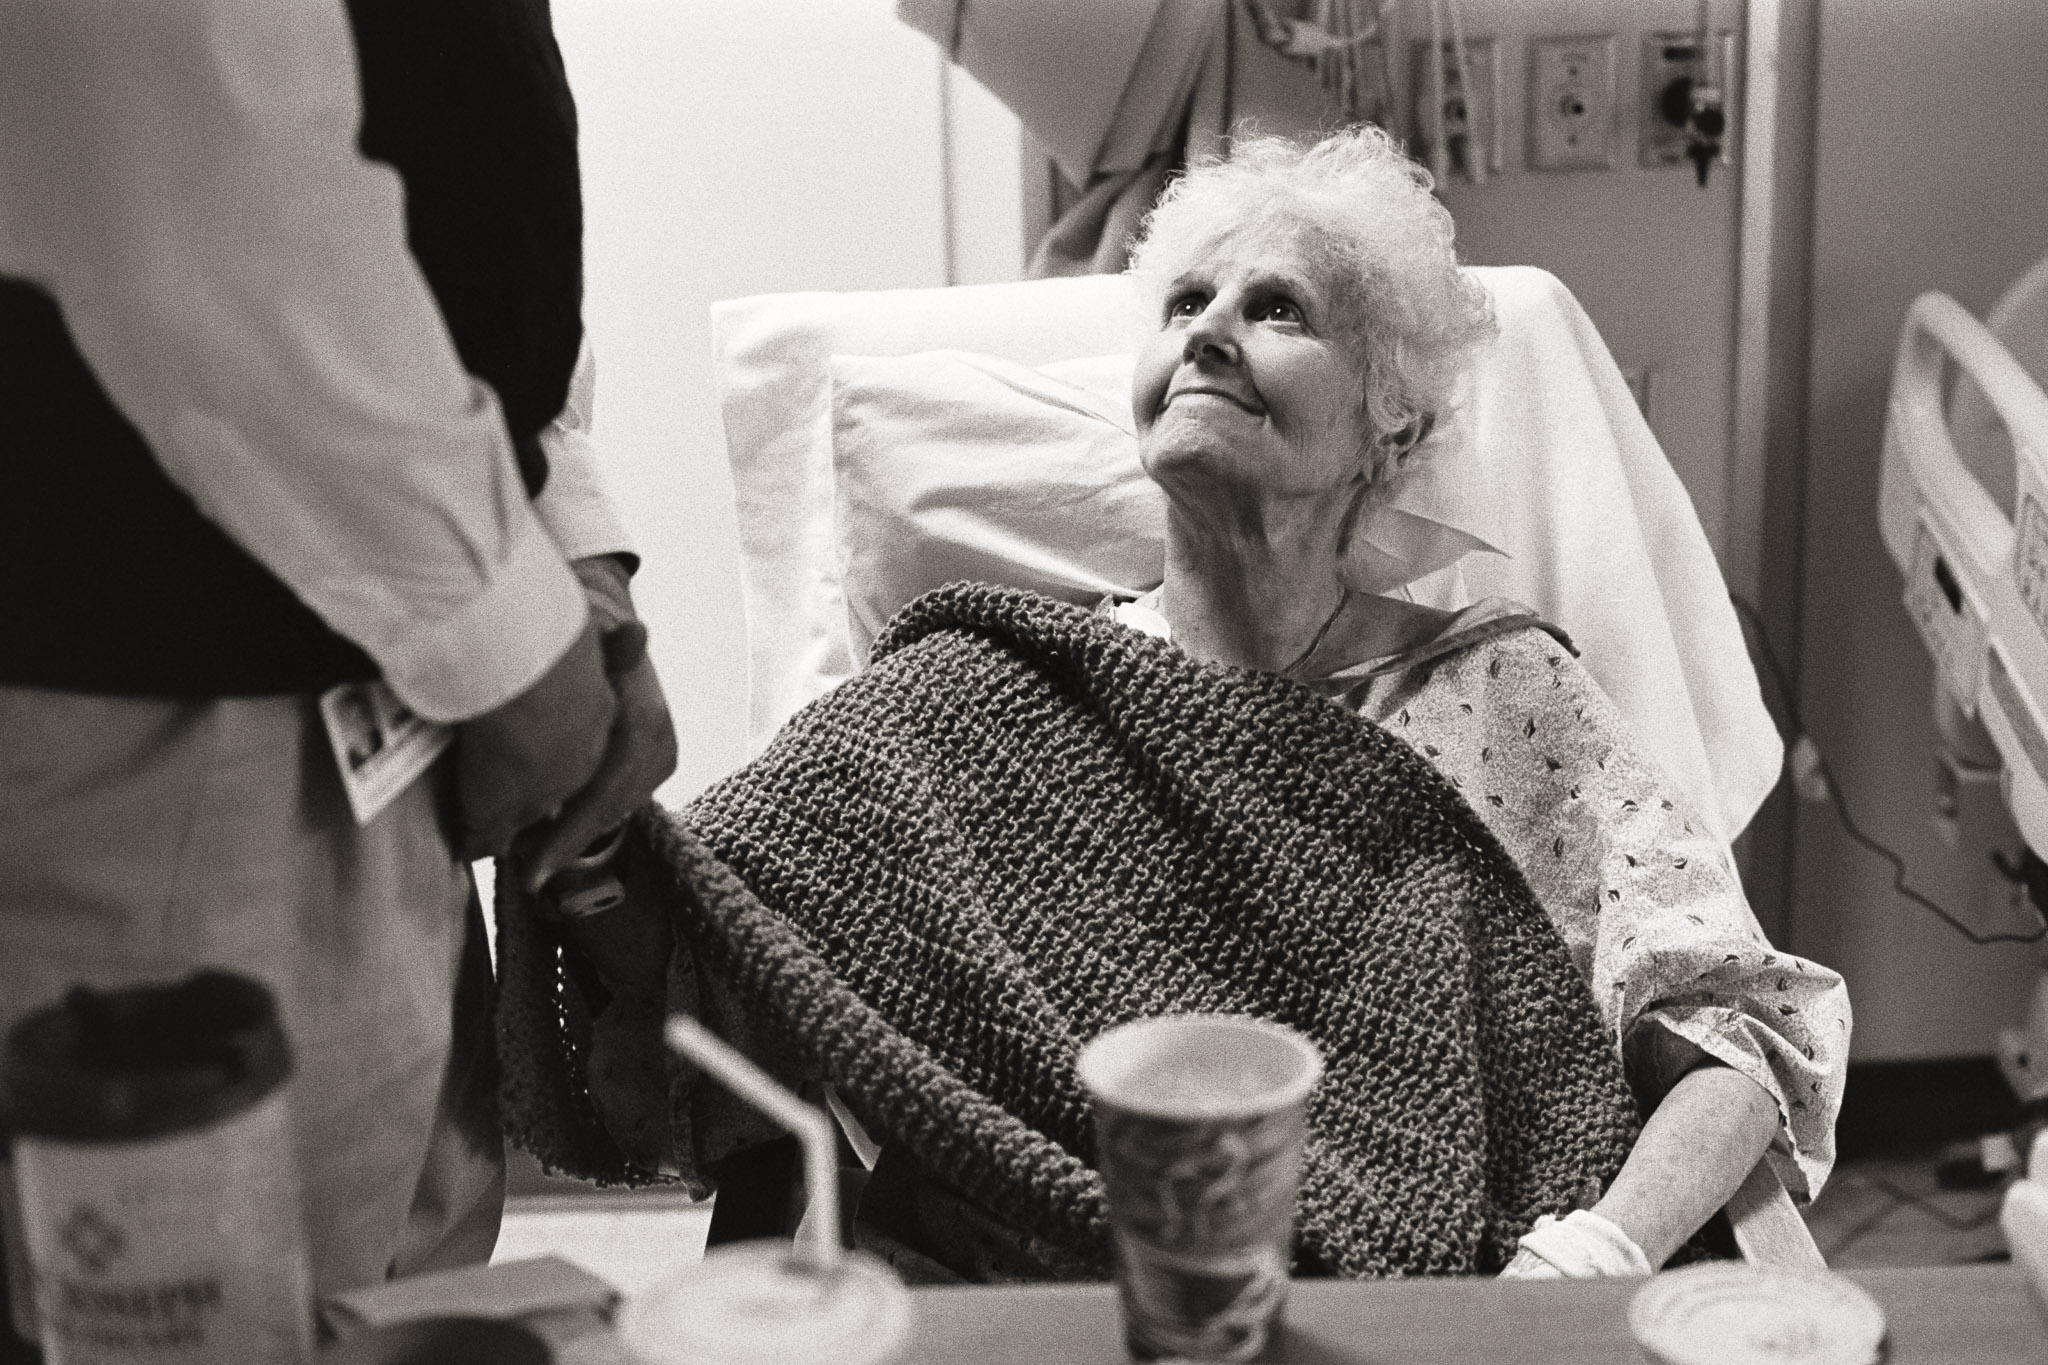 hospital_Lomanno_1371_AB036.jpg